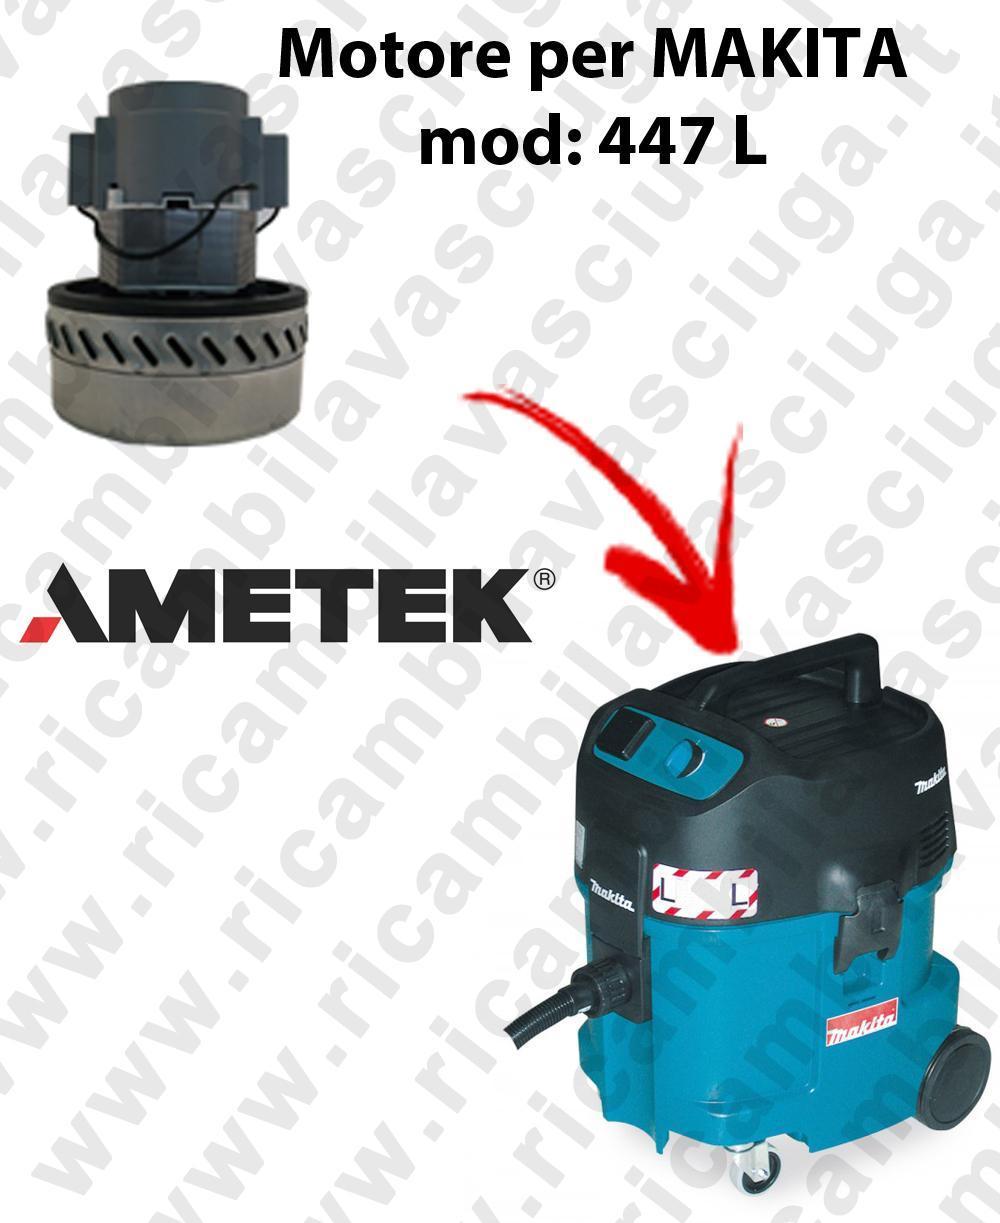 447 L Saugmotor AMETEK für Staubsauger MAKITA